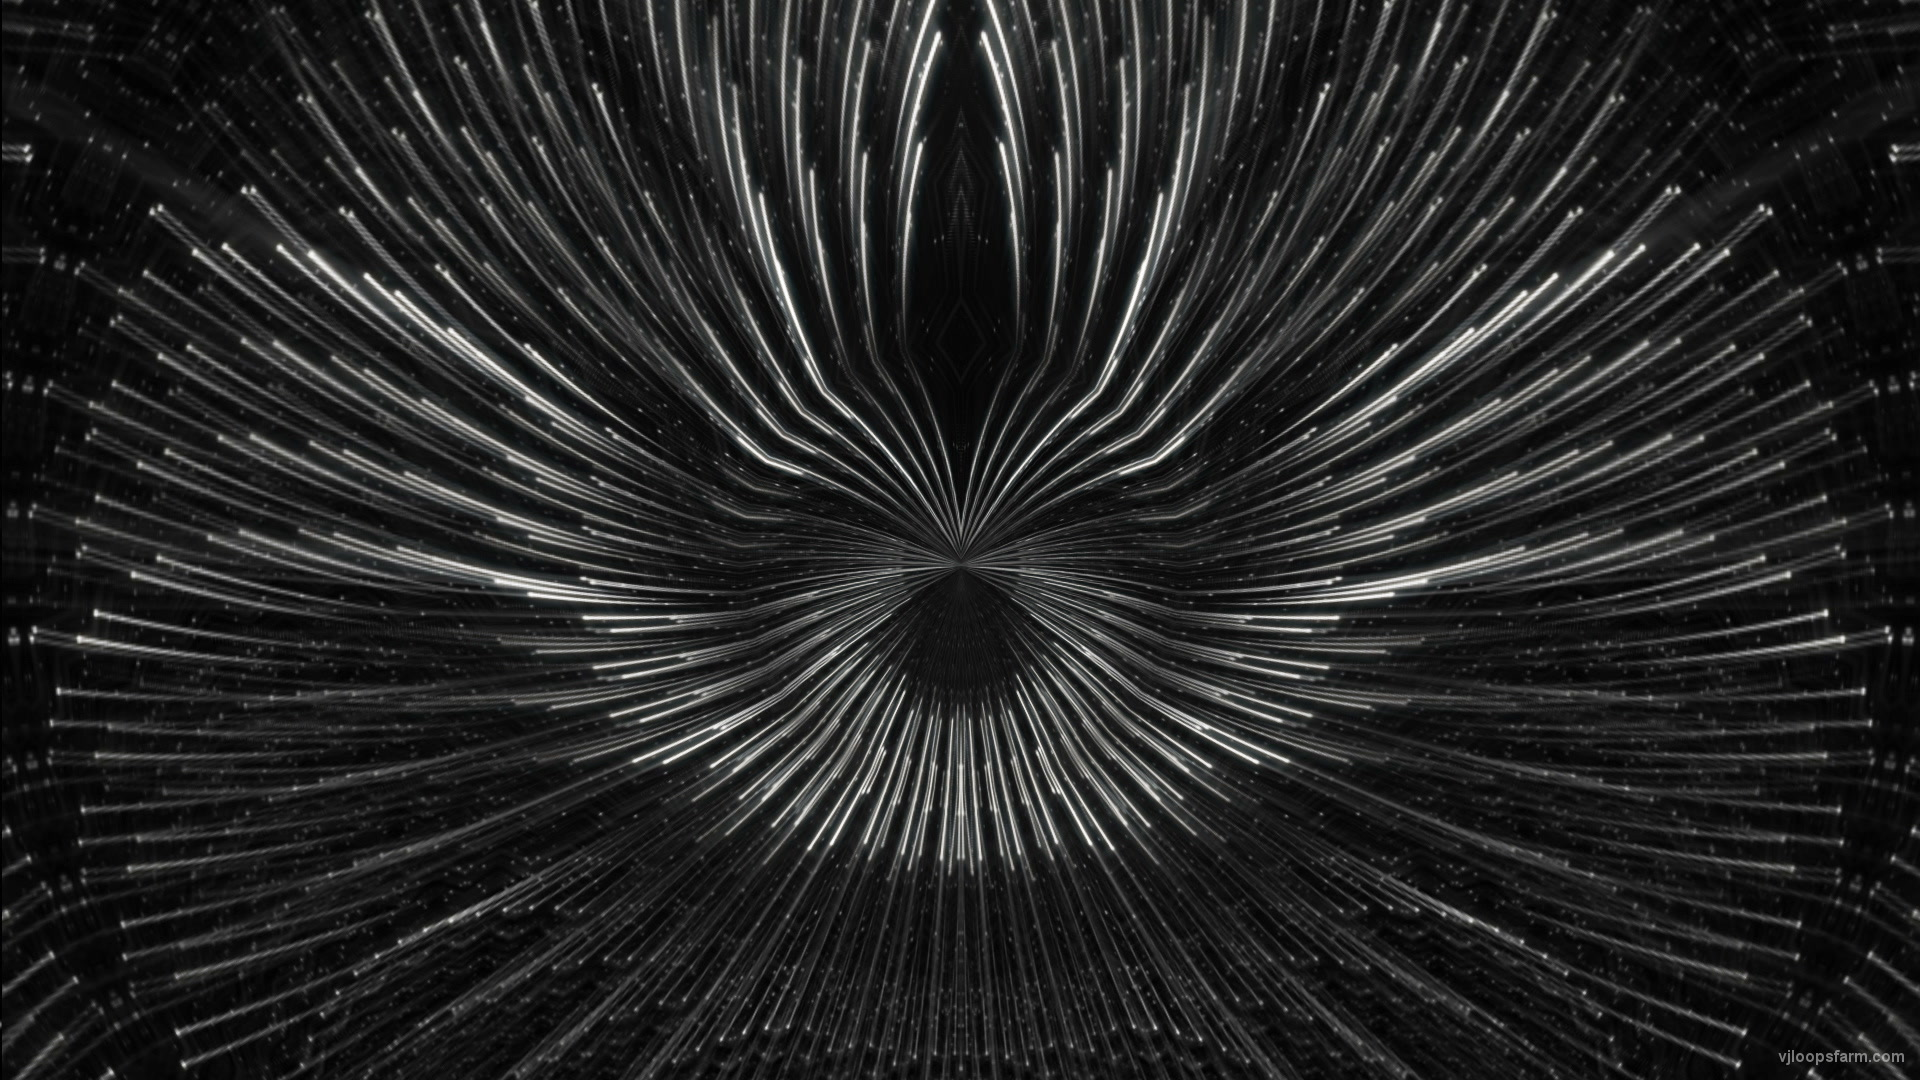 vj video background Luzztro-Decor-Radial-Video-Motion-Background-White-Lines-VJ-Loop_003